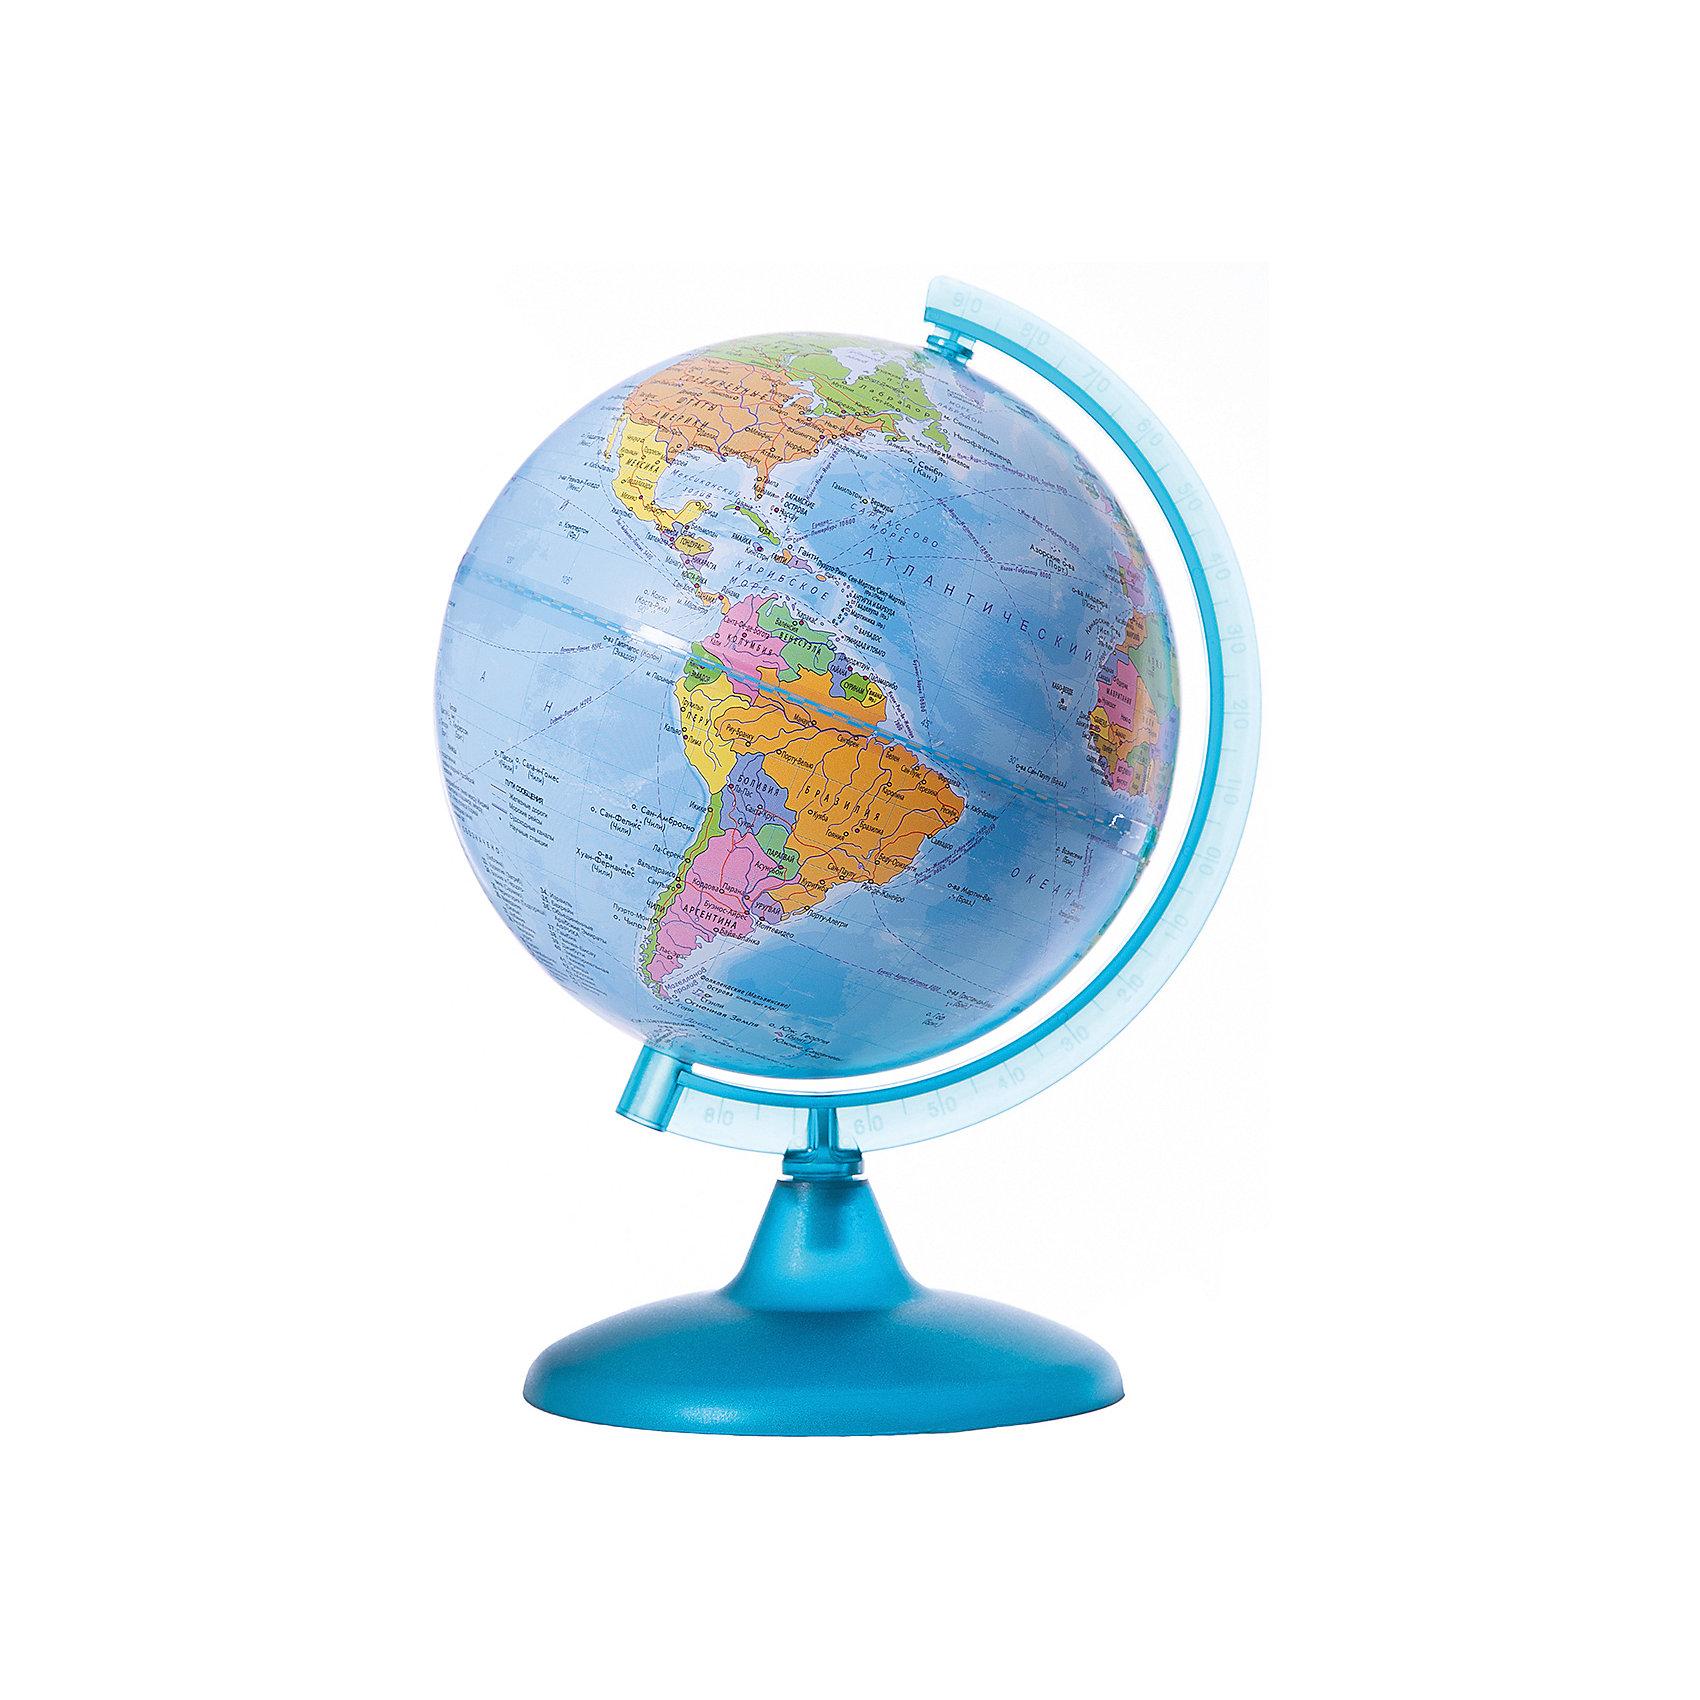 Глобус Земли политический, диаметр 210 ммДиаметр: 210 мм<br><br>Масштаб: 1:60 000 000<br><br>Материал подставки: пластик<br><br>Цвет подставки: прозрачный<br><br>Ширина мм: 217<br>Глубина мм: 217<br>Высота мм: 300<br>Вес г: 180<br>Возраст от месяцев: 72<br>Возраст до месяцев: 2147483647<br>Пол: Унисекс<br>Возраст: Детский<br>SKU: 5518220